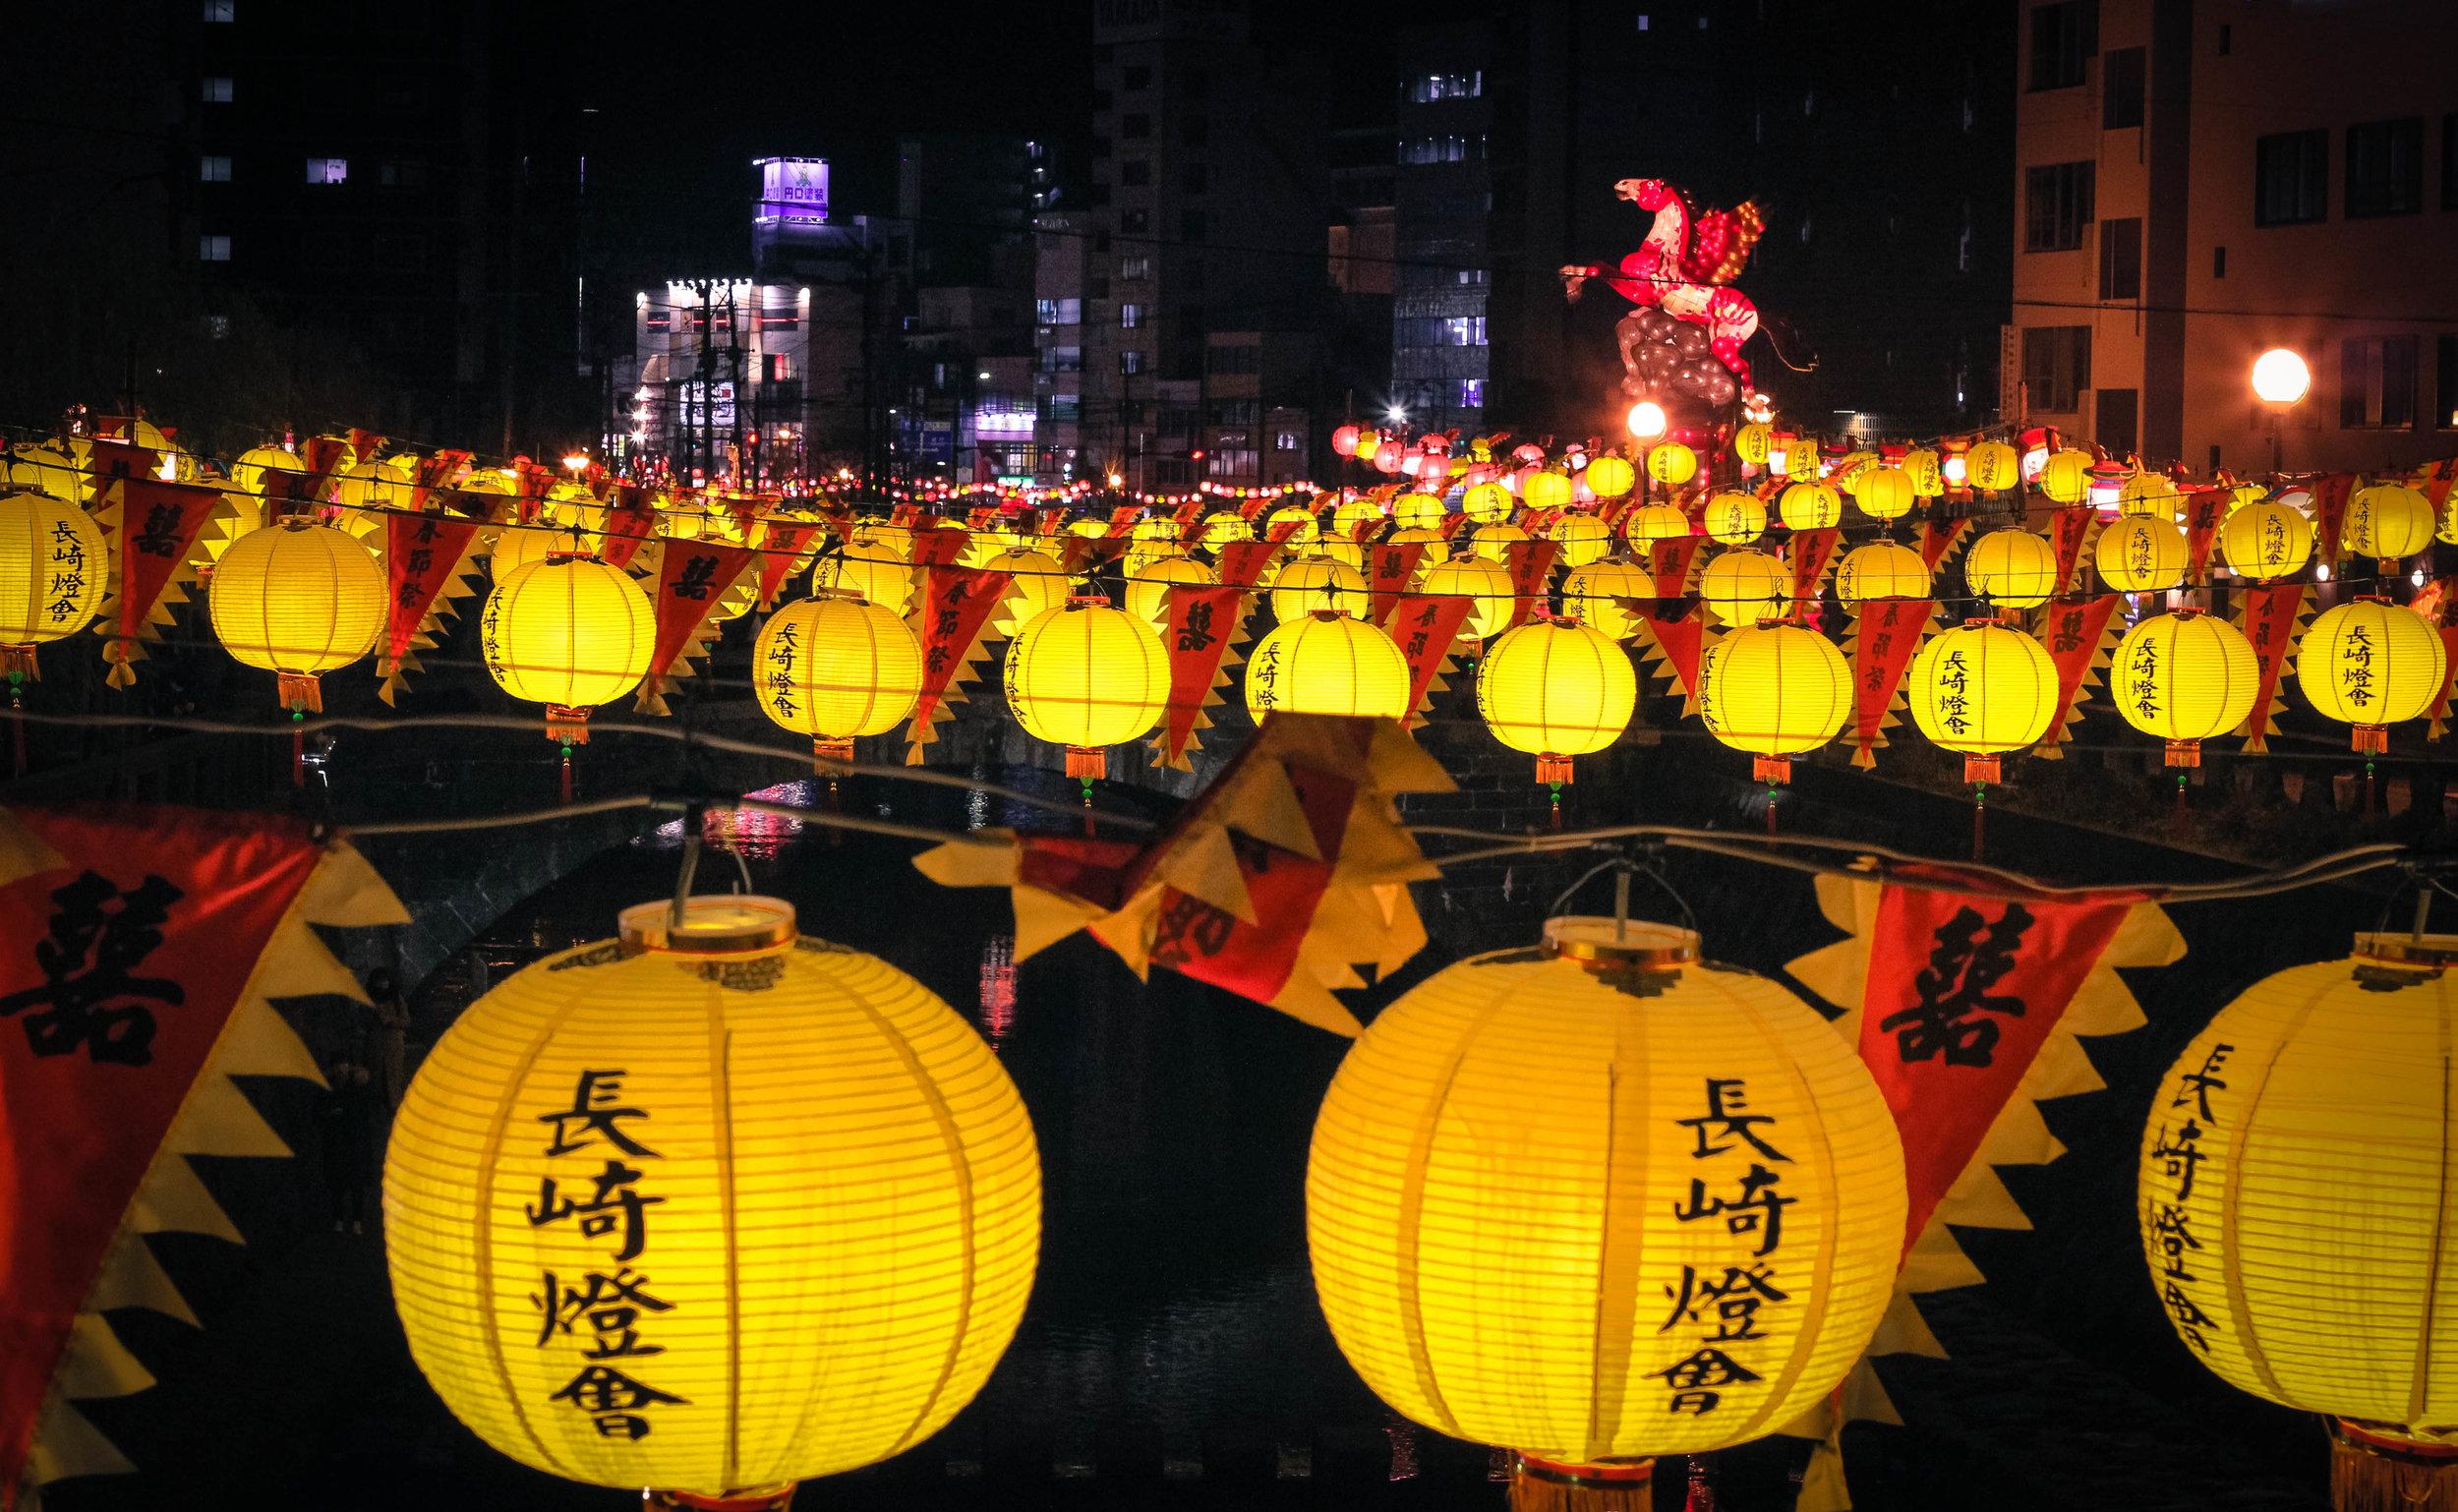 Lanterns lanterns everywhere.